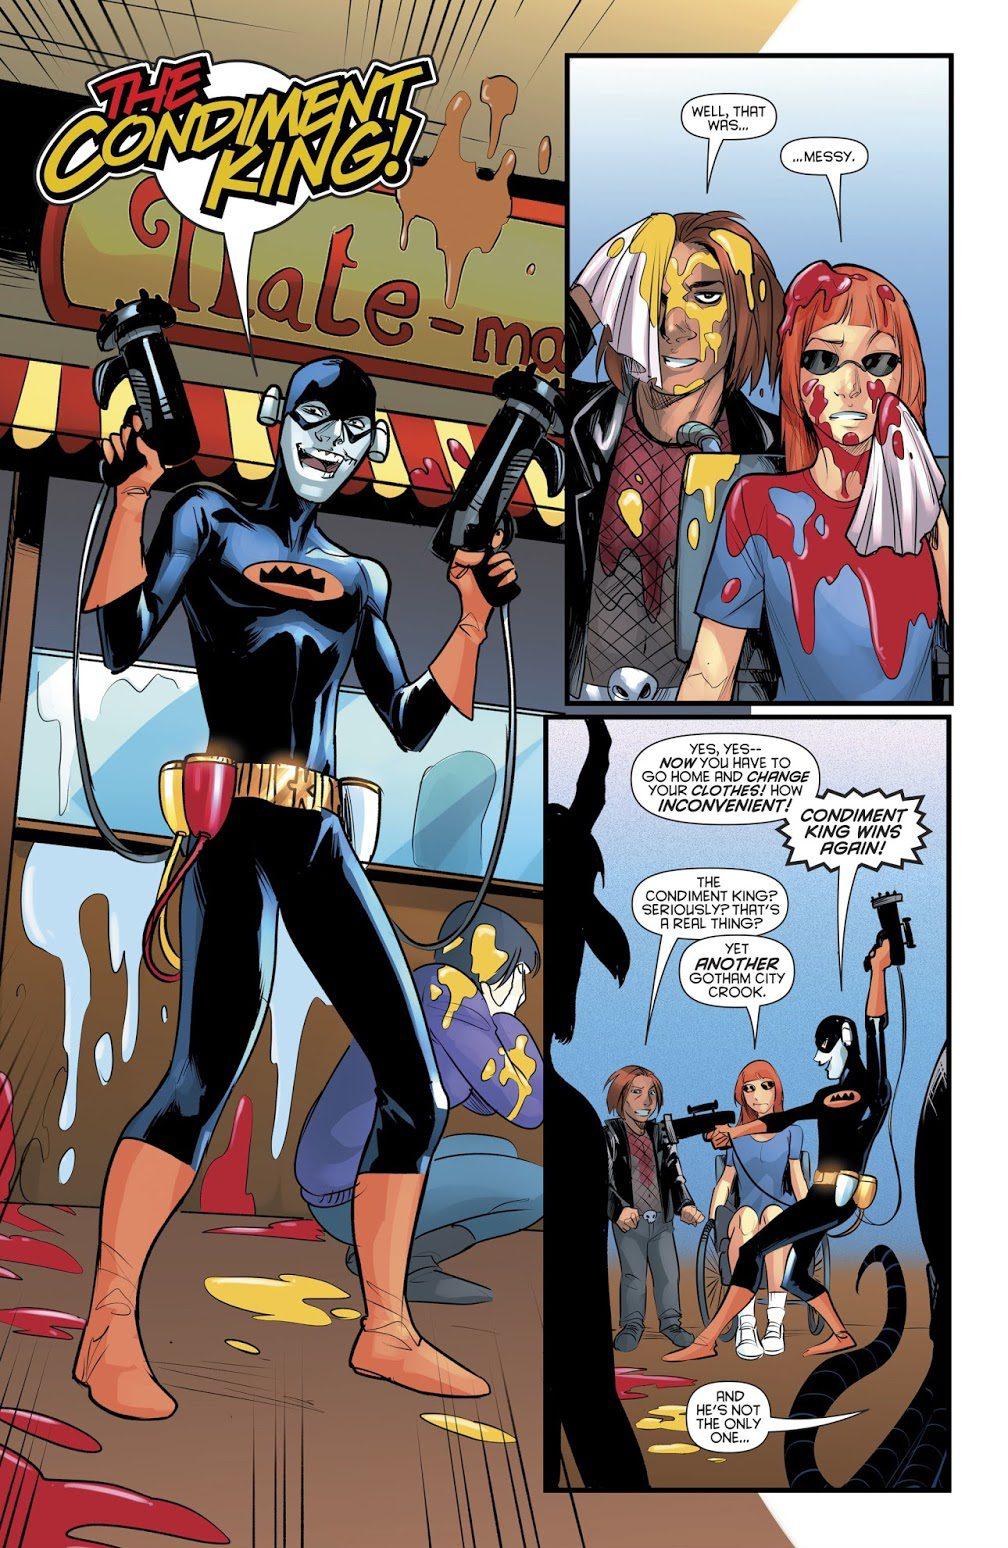 Condiment King (Harley Quinn Vol. 3 #38)